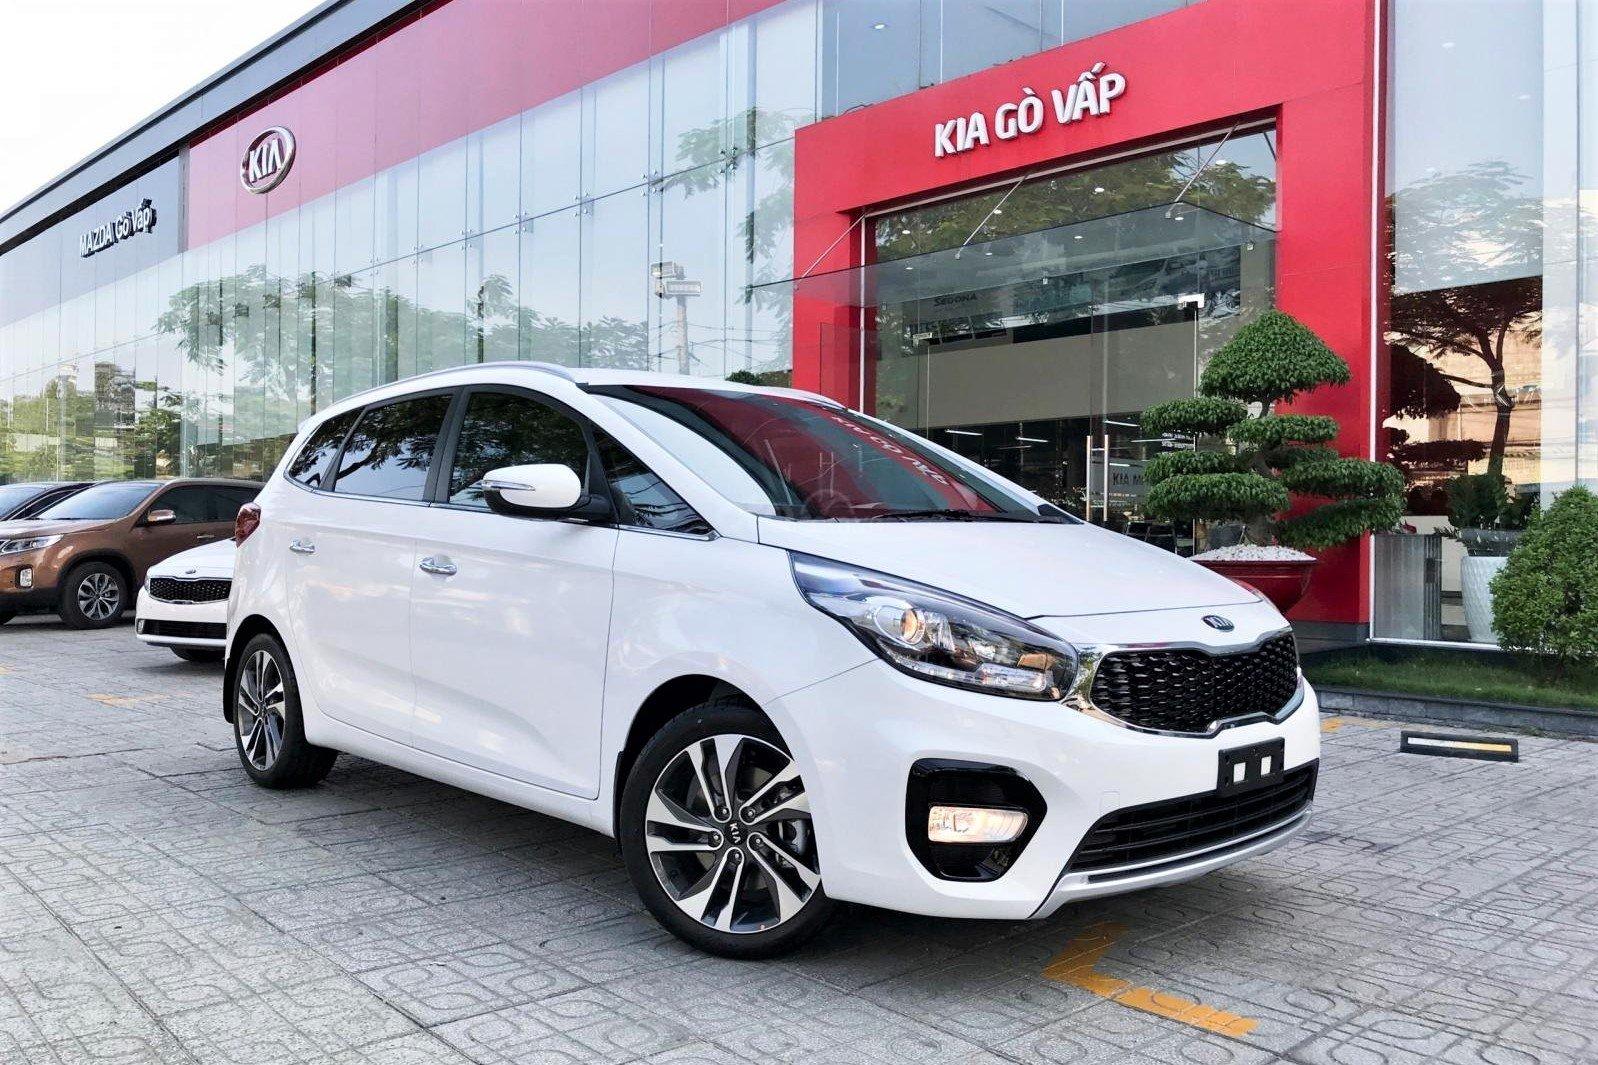 Kia Rondo 2020 tại Việt Nam hiện nay 1